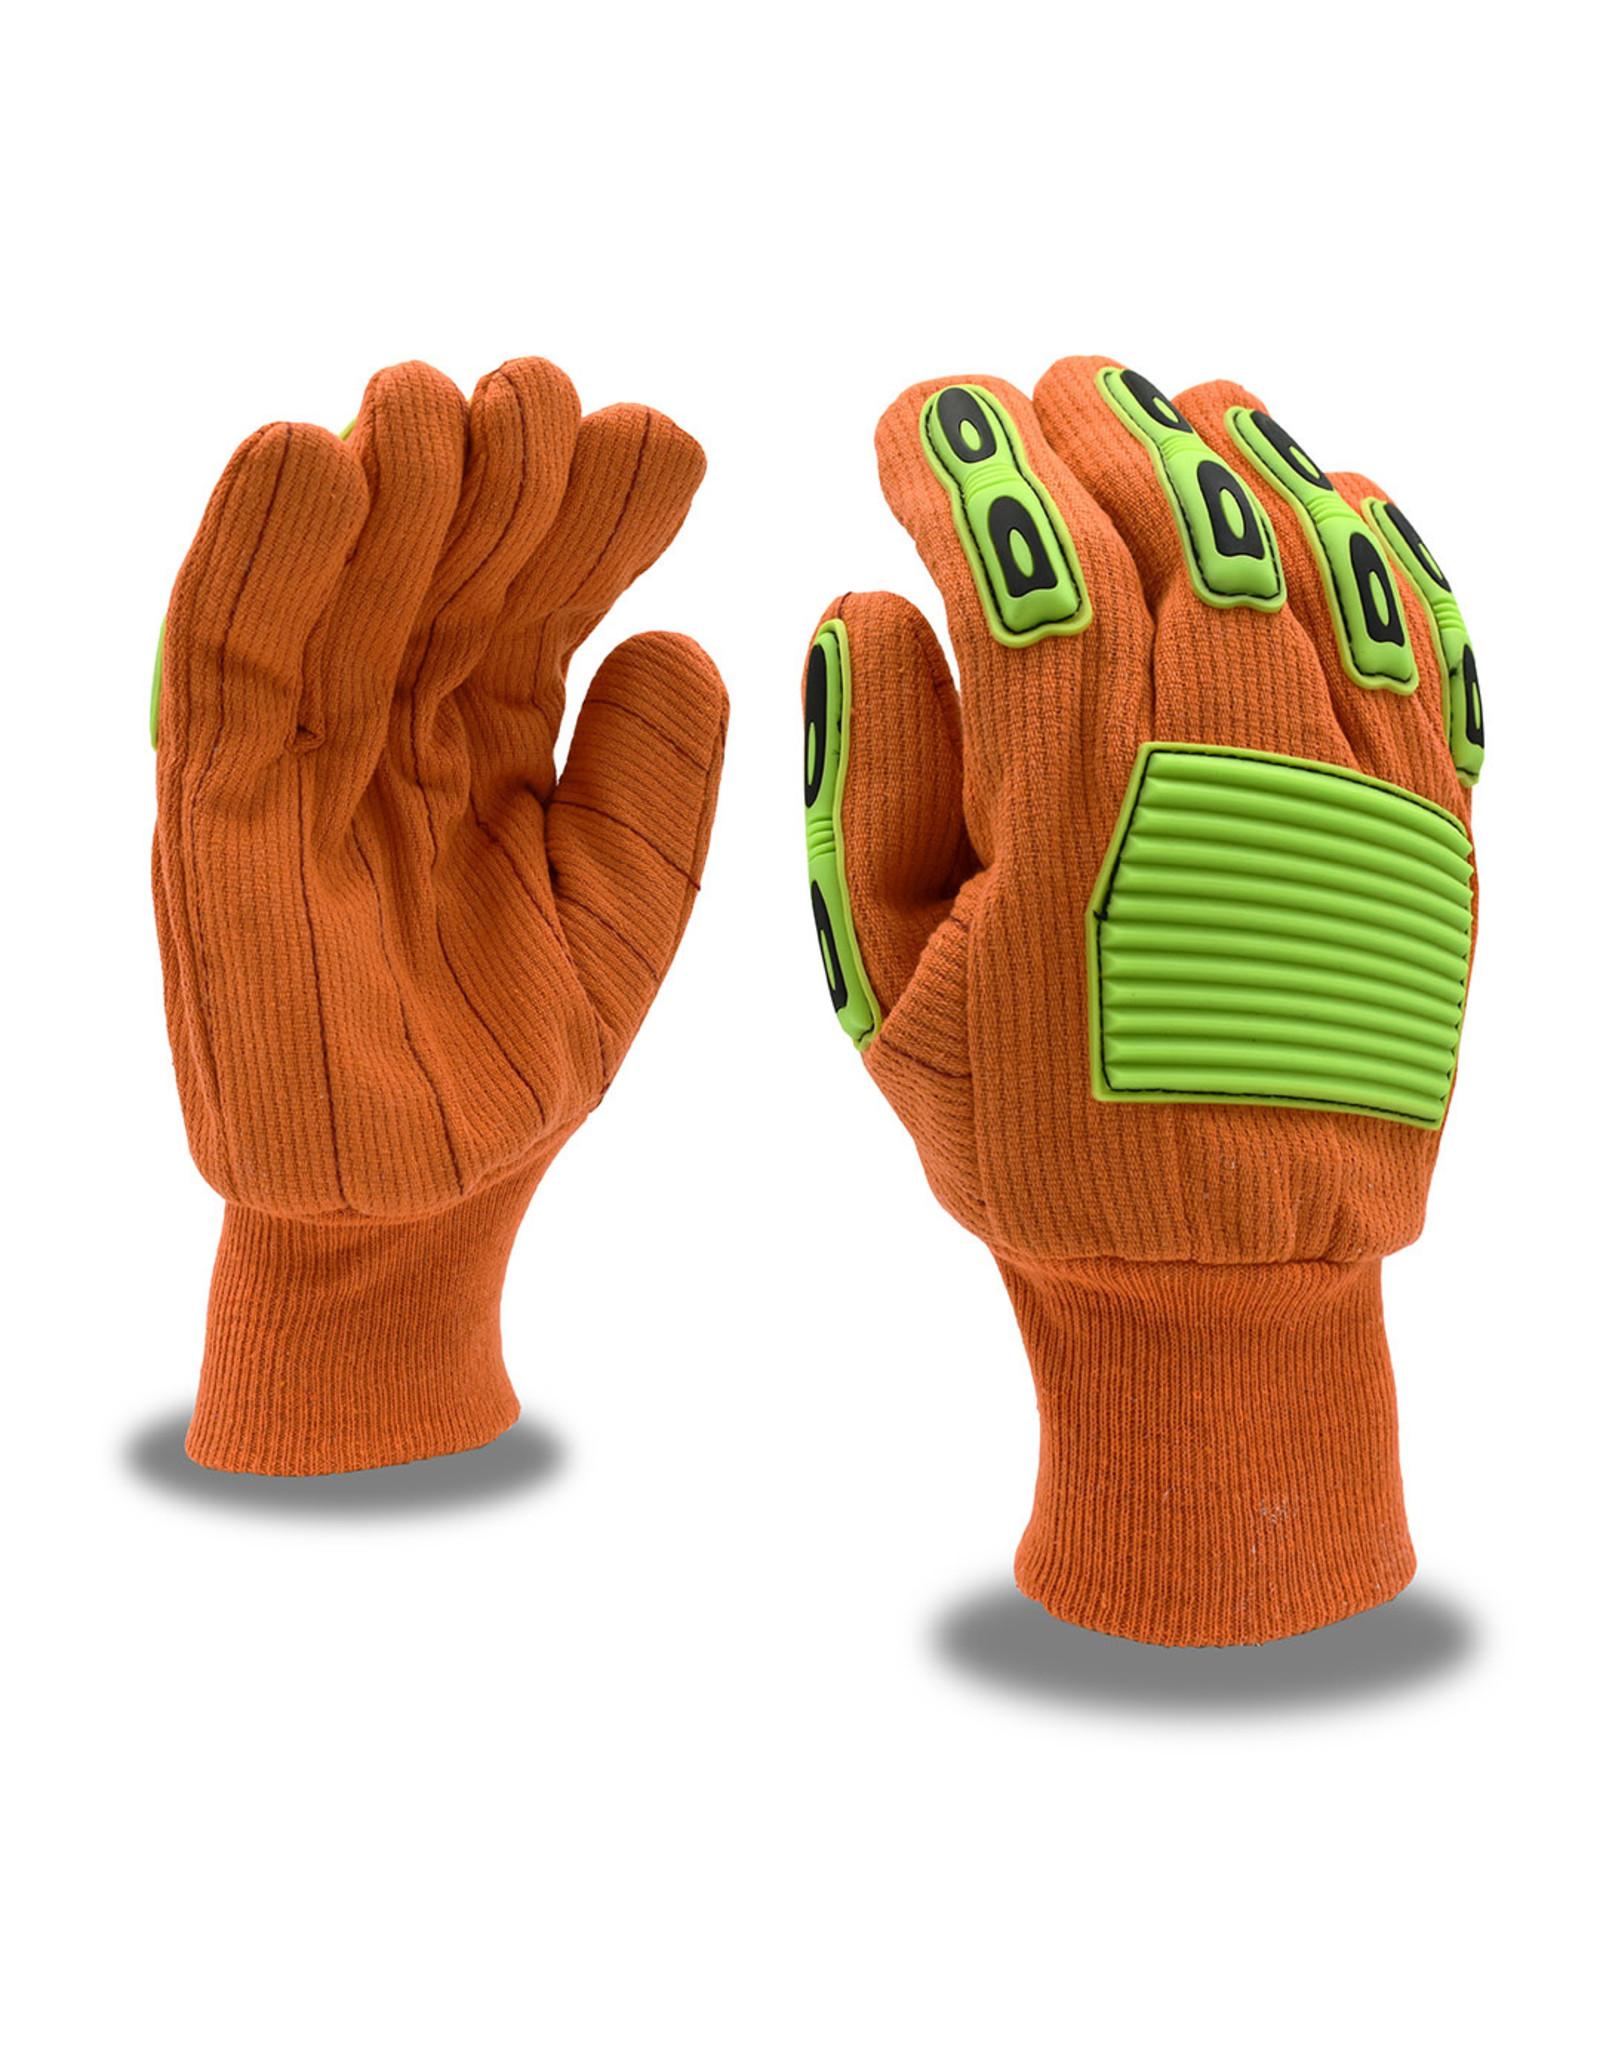 Cordova Impact Protection Canvas, TPR, Knit Wrist, Corded, Double Palm, Cotton Glove